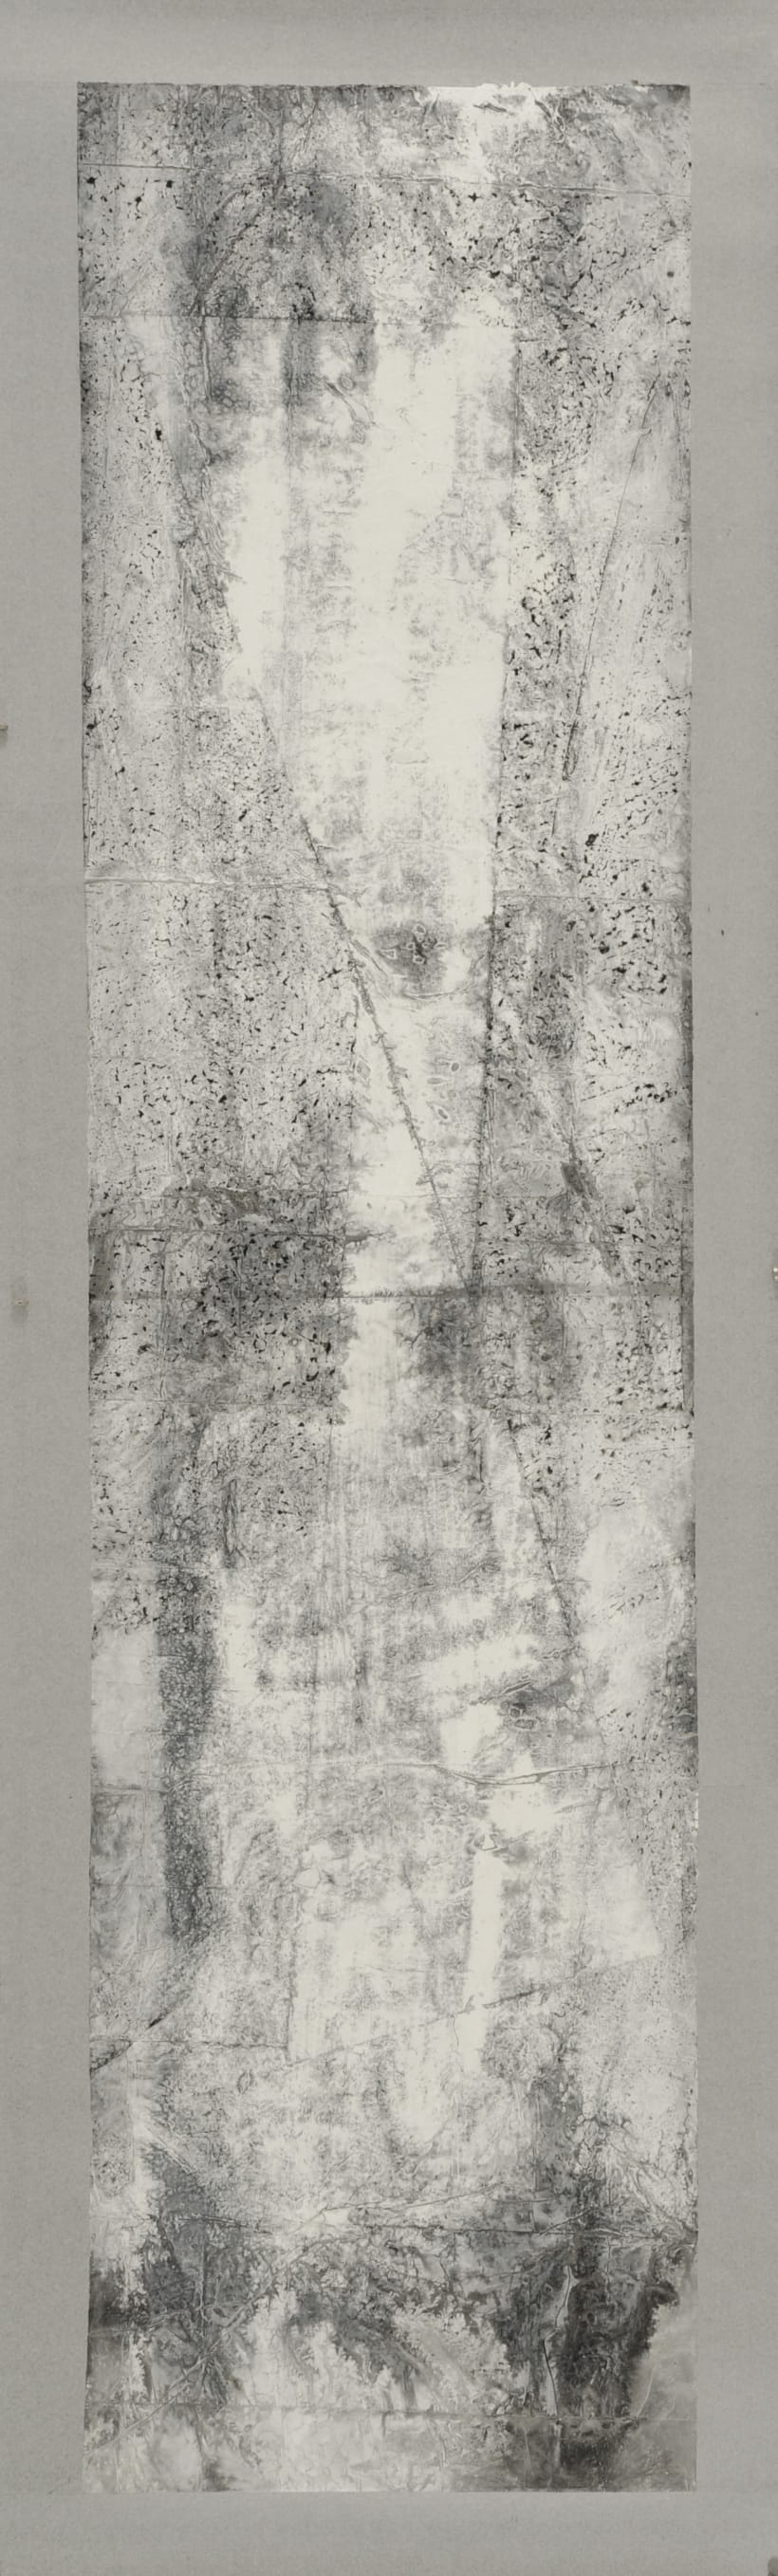 Zheng Chongbin, White Reflection, 2012,  Ink and acrylic on xuan paper, 272 x 68.5 cm